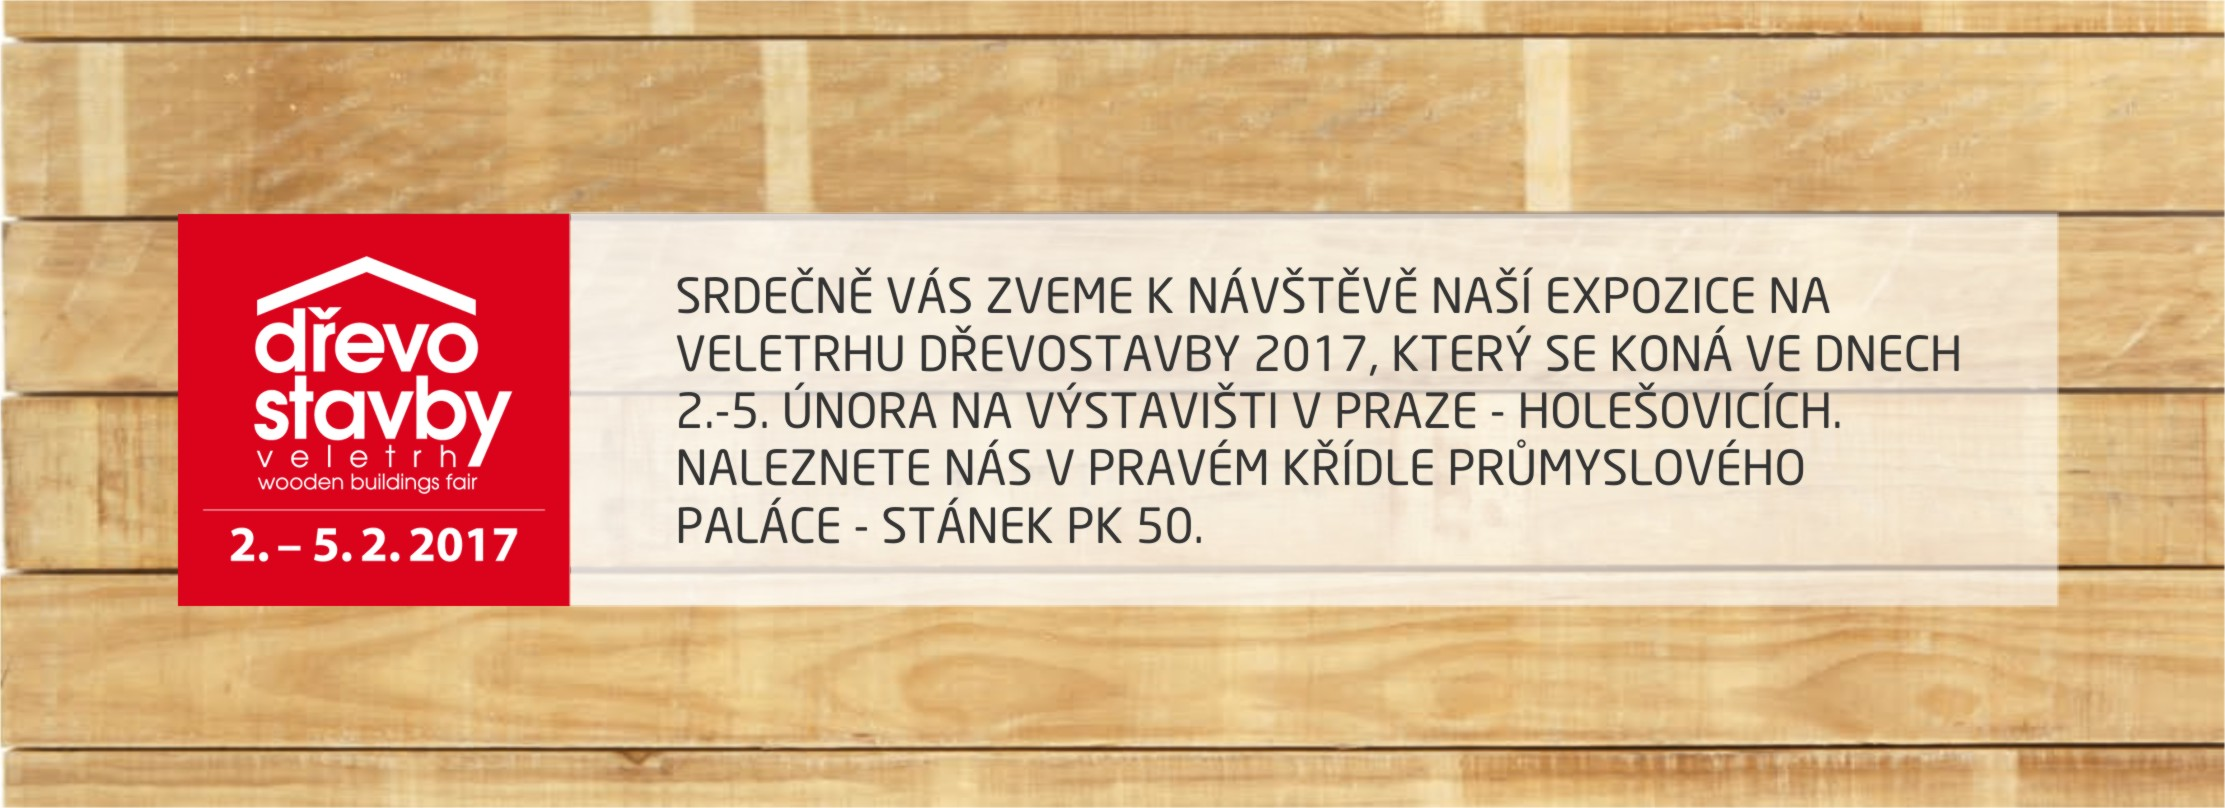 Banner Dřevostavby 2017 ACCOYA